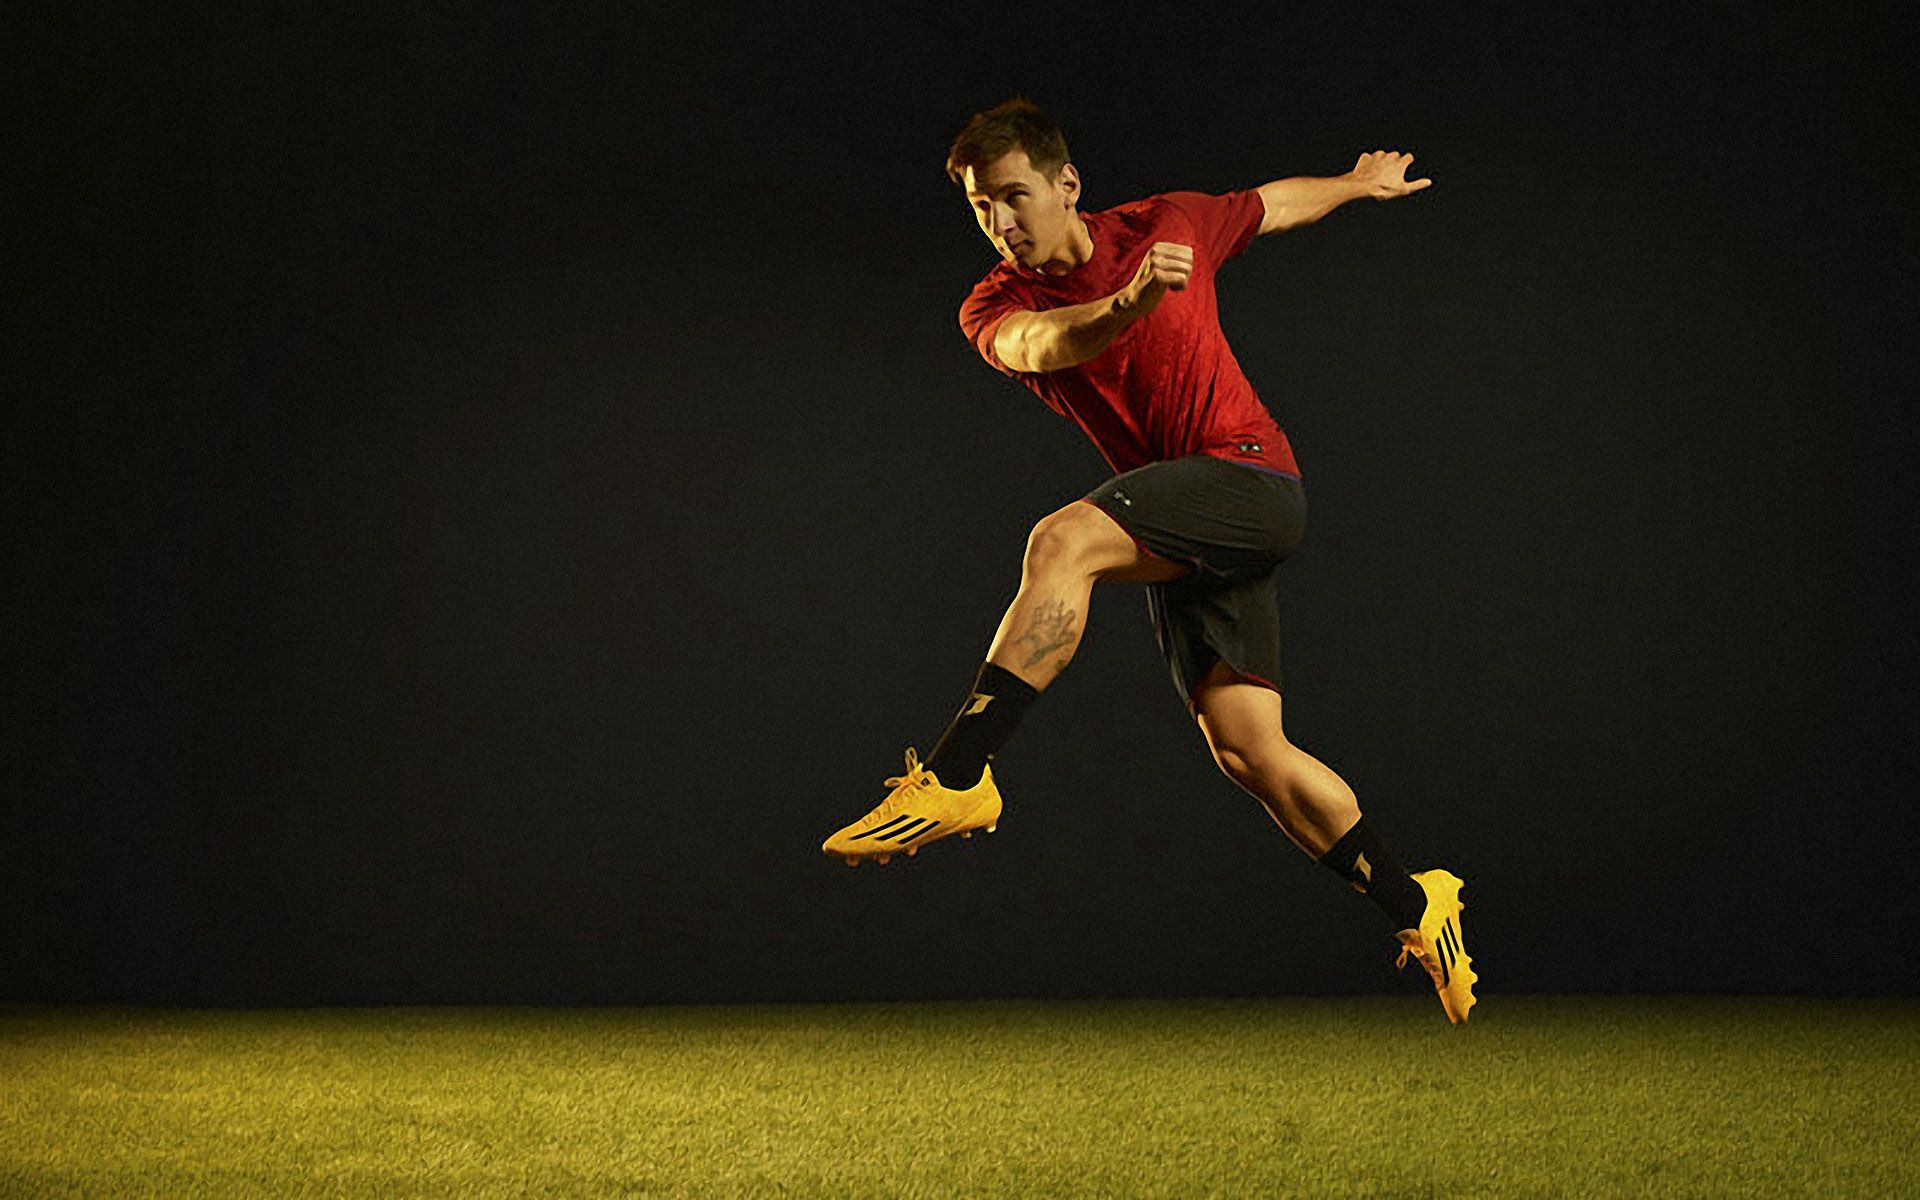 Adidas Soccer Wallpaper Hd Wallpaper Wiki Gold Adidas Adidas Soccer Lionel Messi